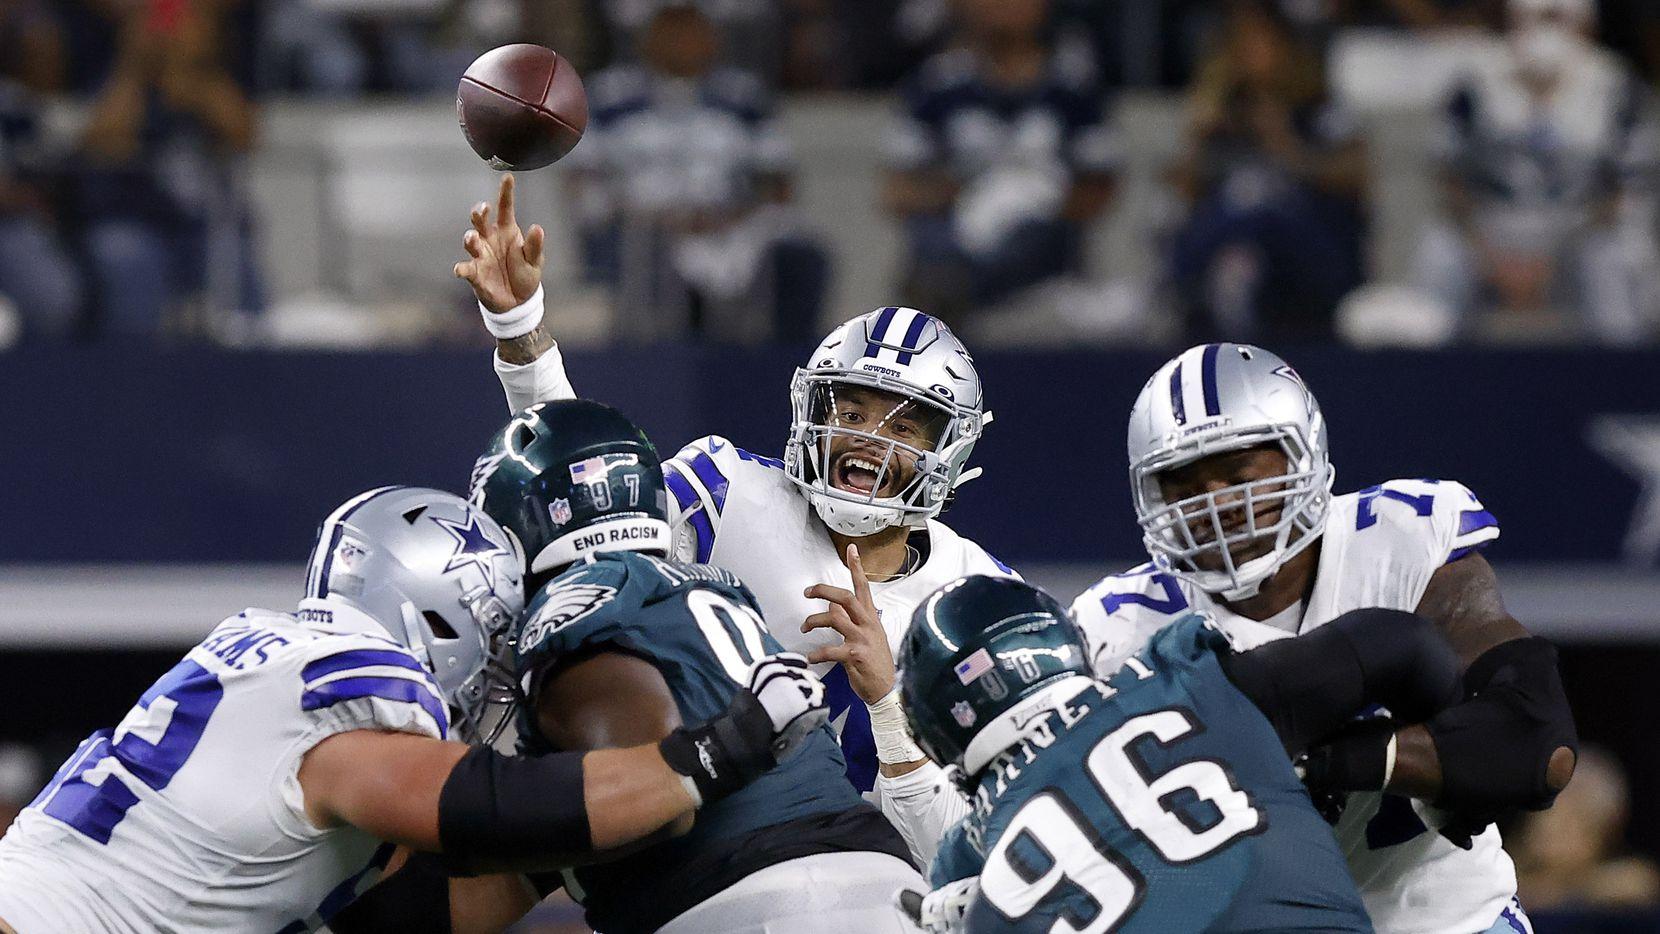 Dallas Cowboys quarterback Dak Prescott (4) releases a pass over the Philadelphia Eagles defensive line during the second quarter at AT&T Stadium in Arlington, Monday, September 27, 2021.